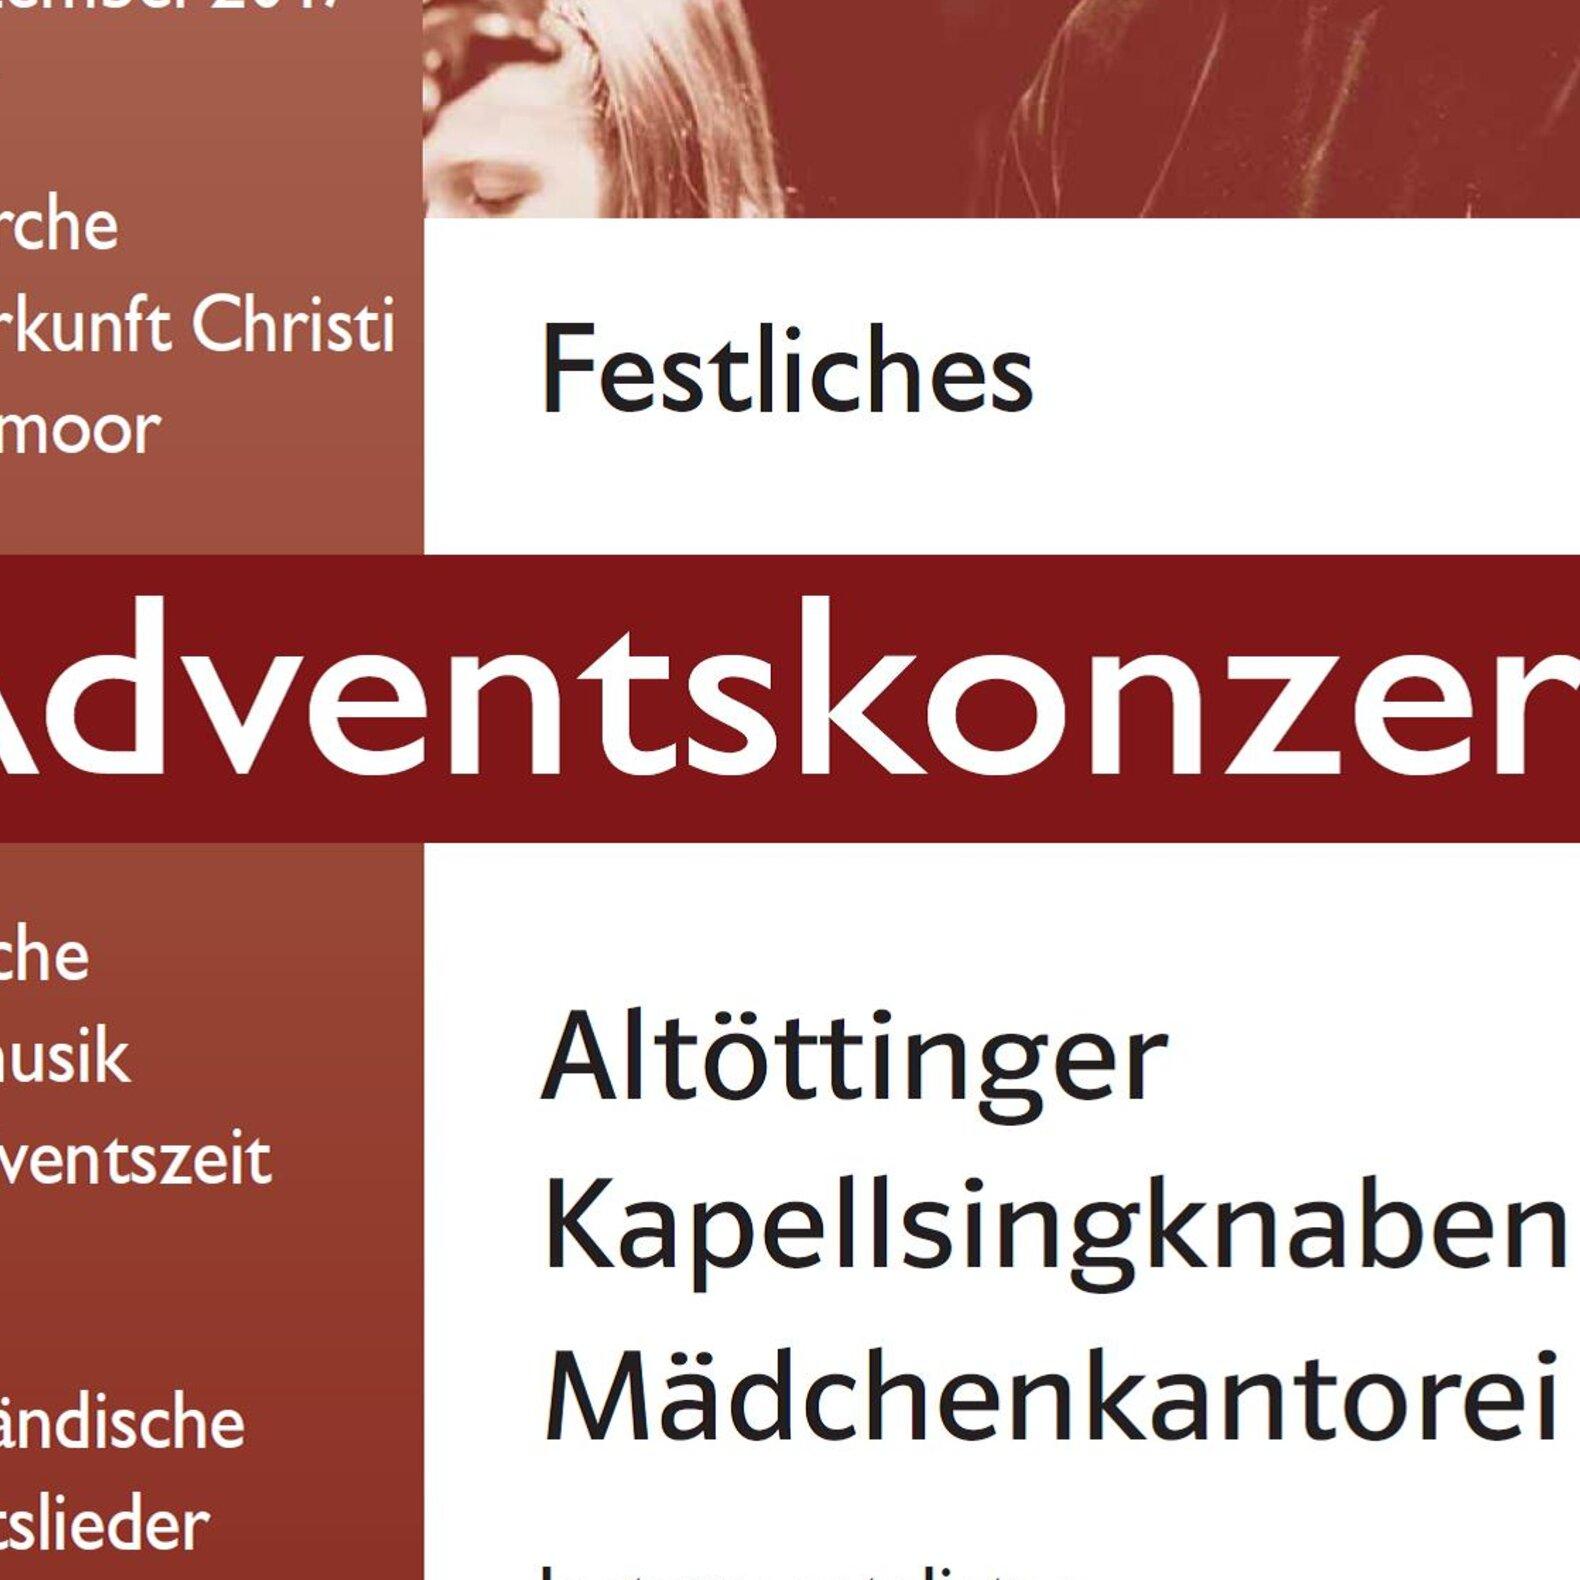 Festliches Adventskonzert - Altöttinger Kapellsingknaben und Mädchenkantorei